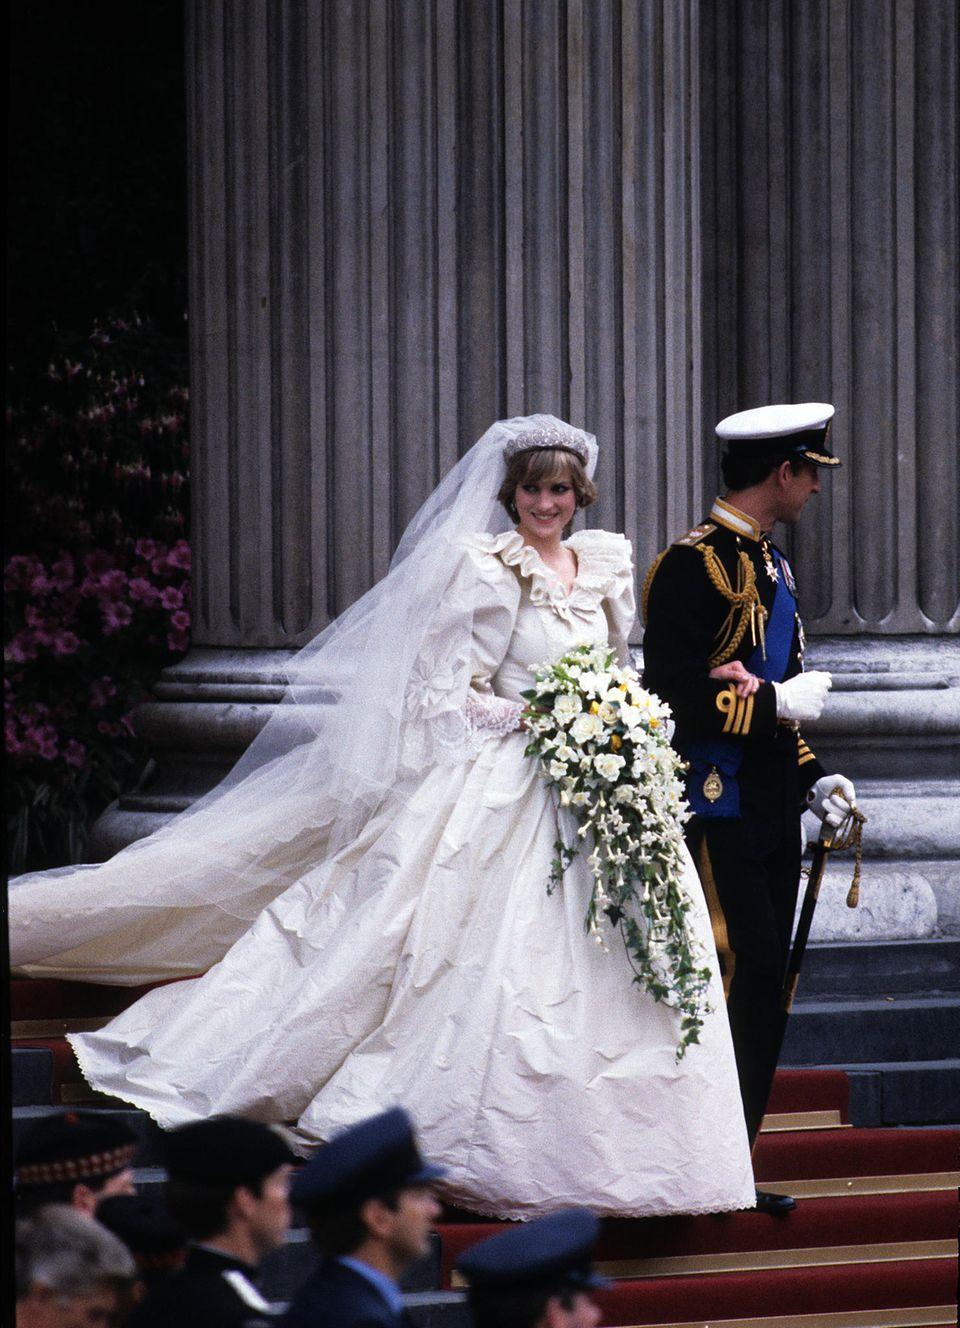 Royale Hochzeitskleider: Prinzessin Diana